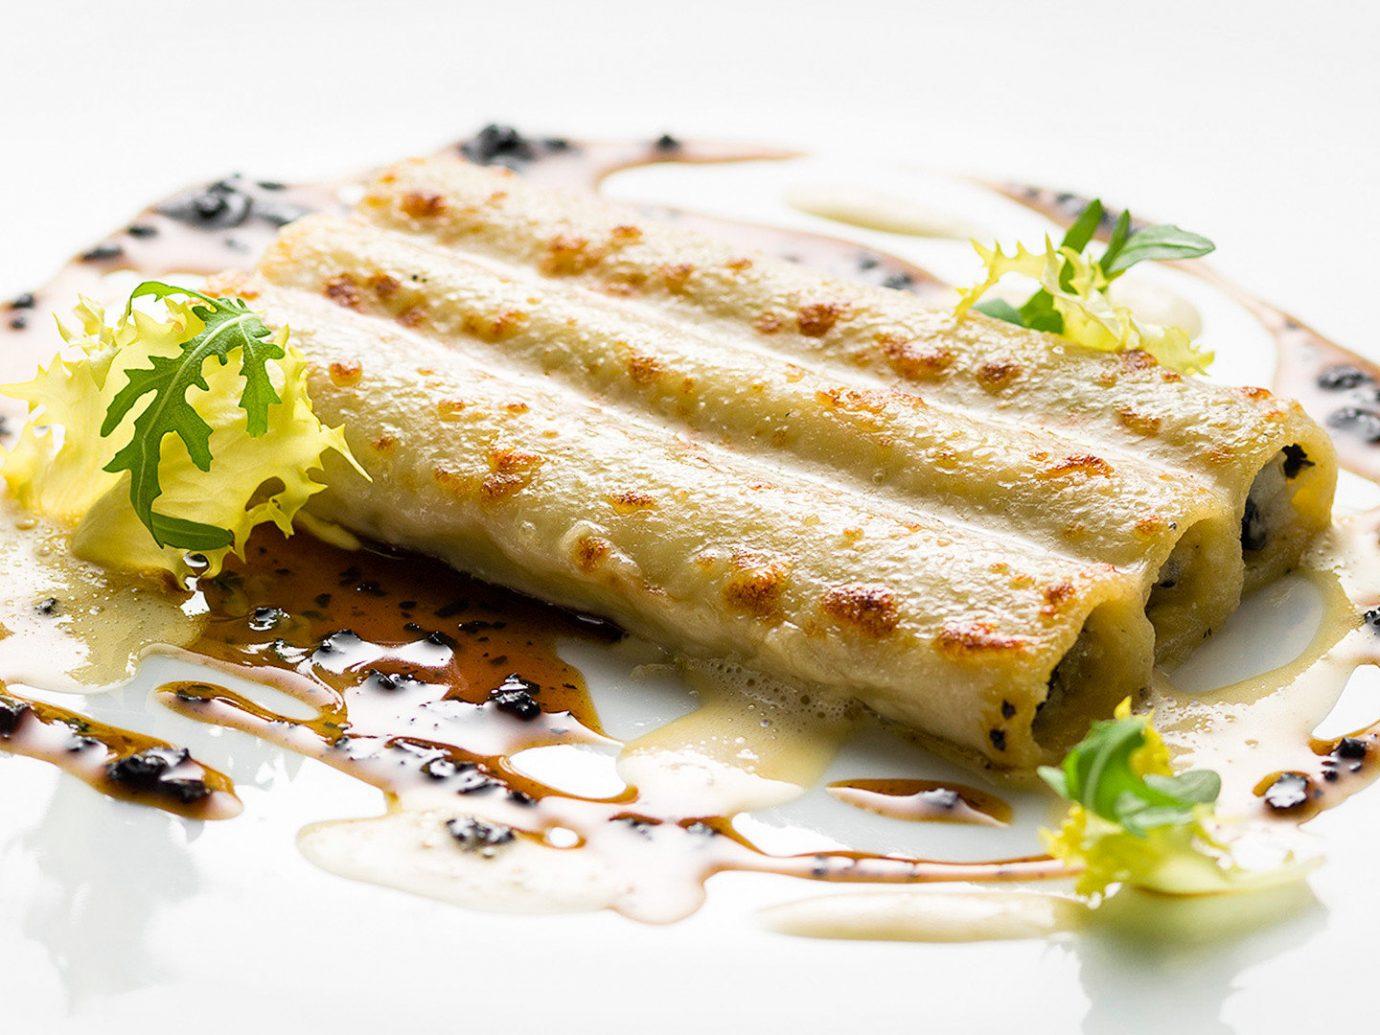 Food + Drink Romance plate food piece table slice dish fork cuisine cream dessert vegetarian food recipe pasta